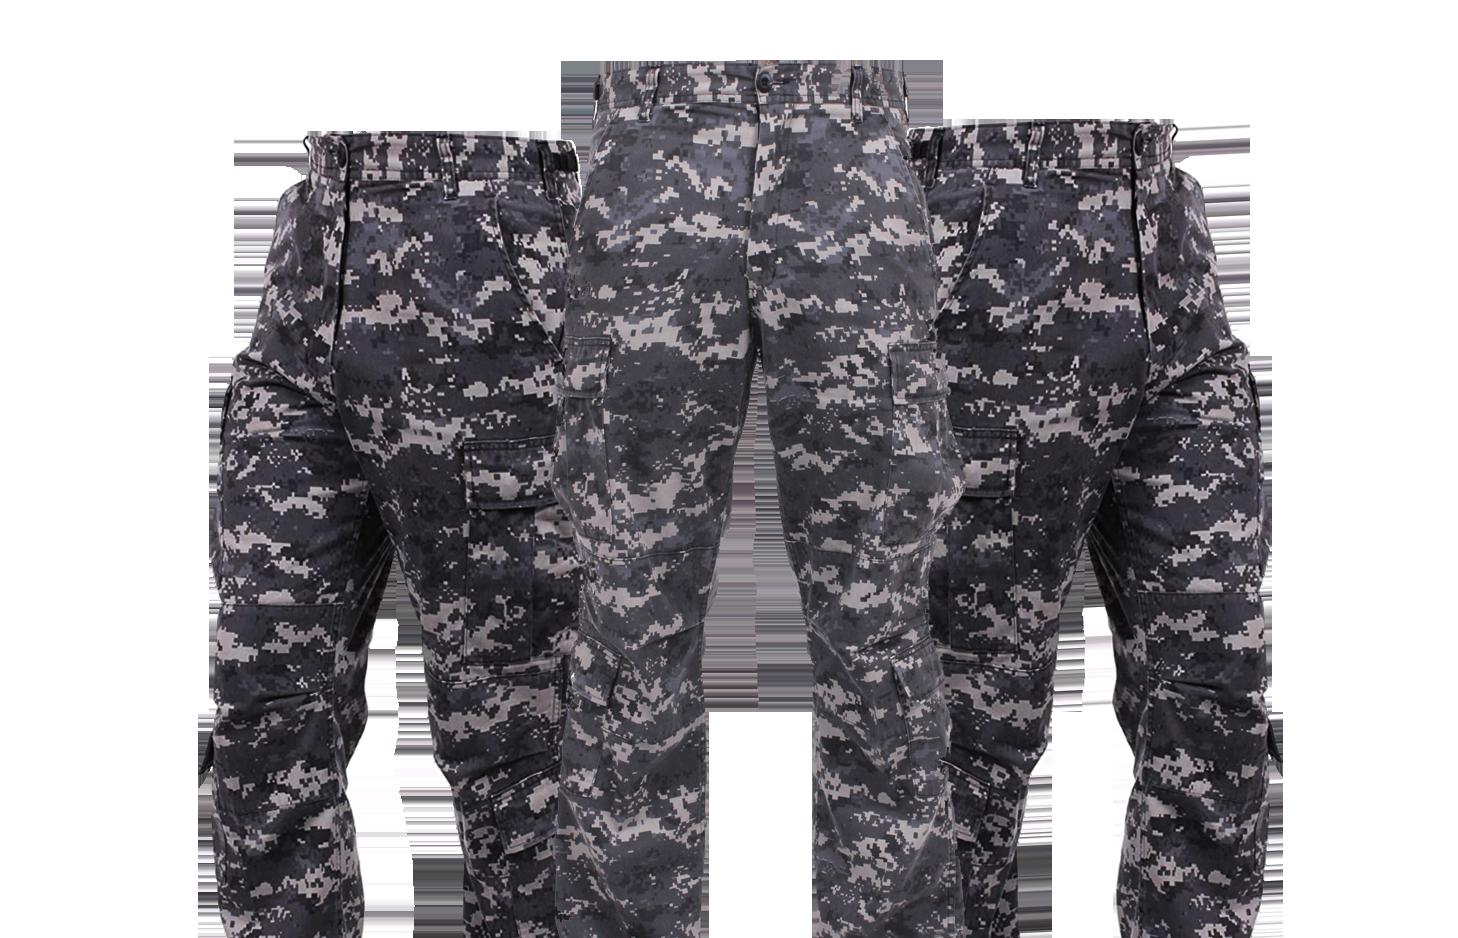 military tactical pants at bereli